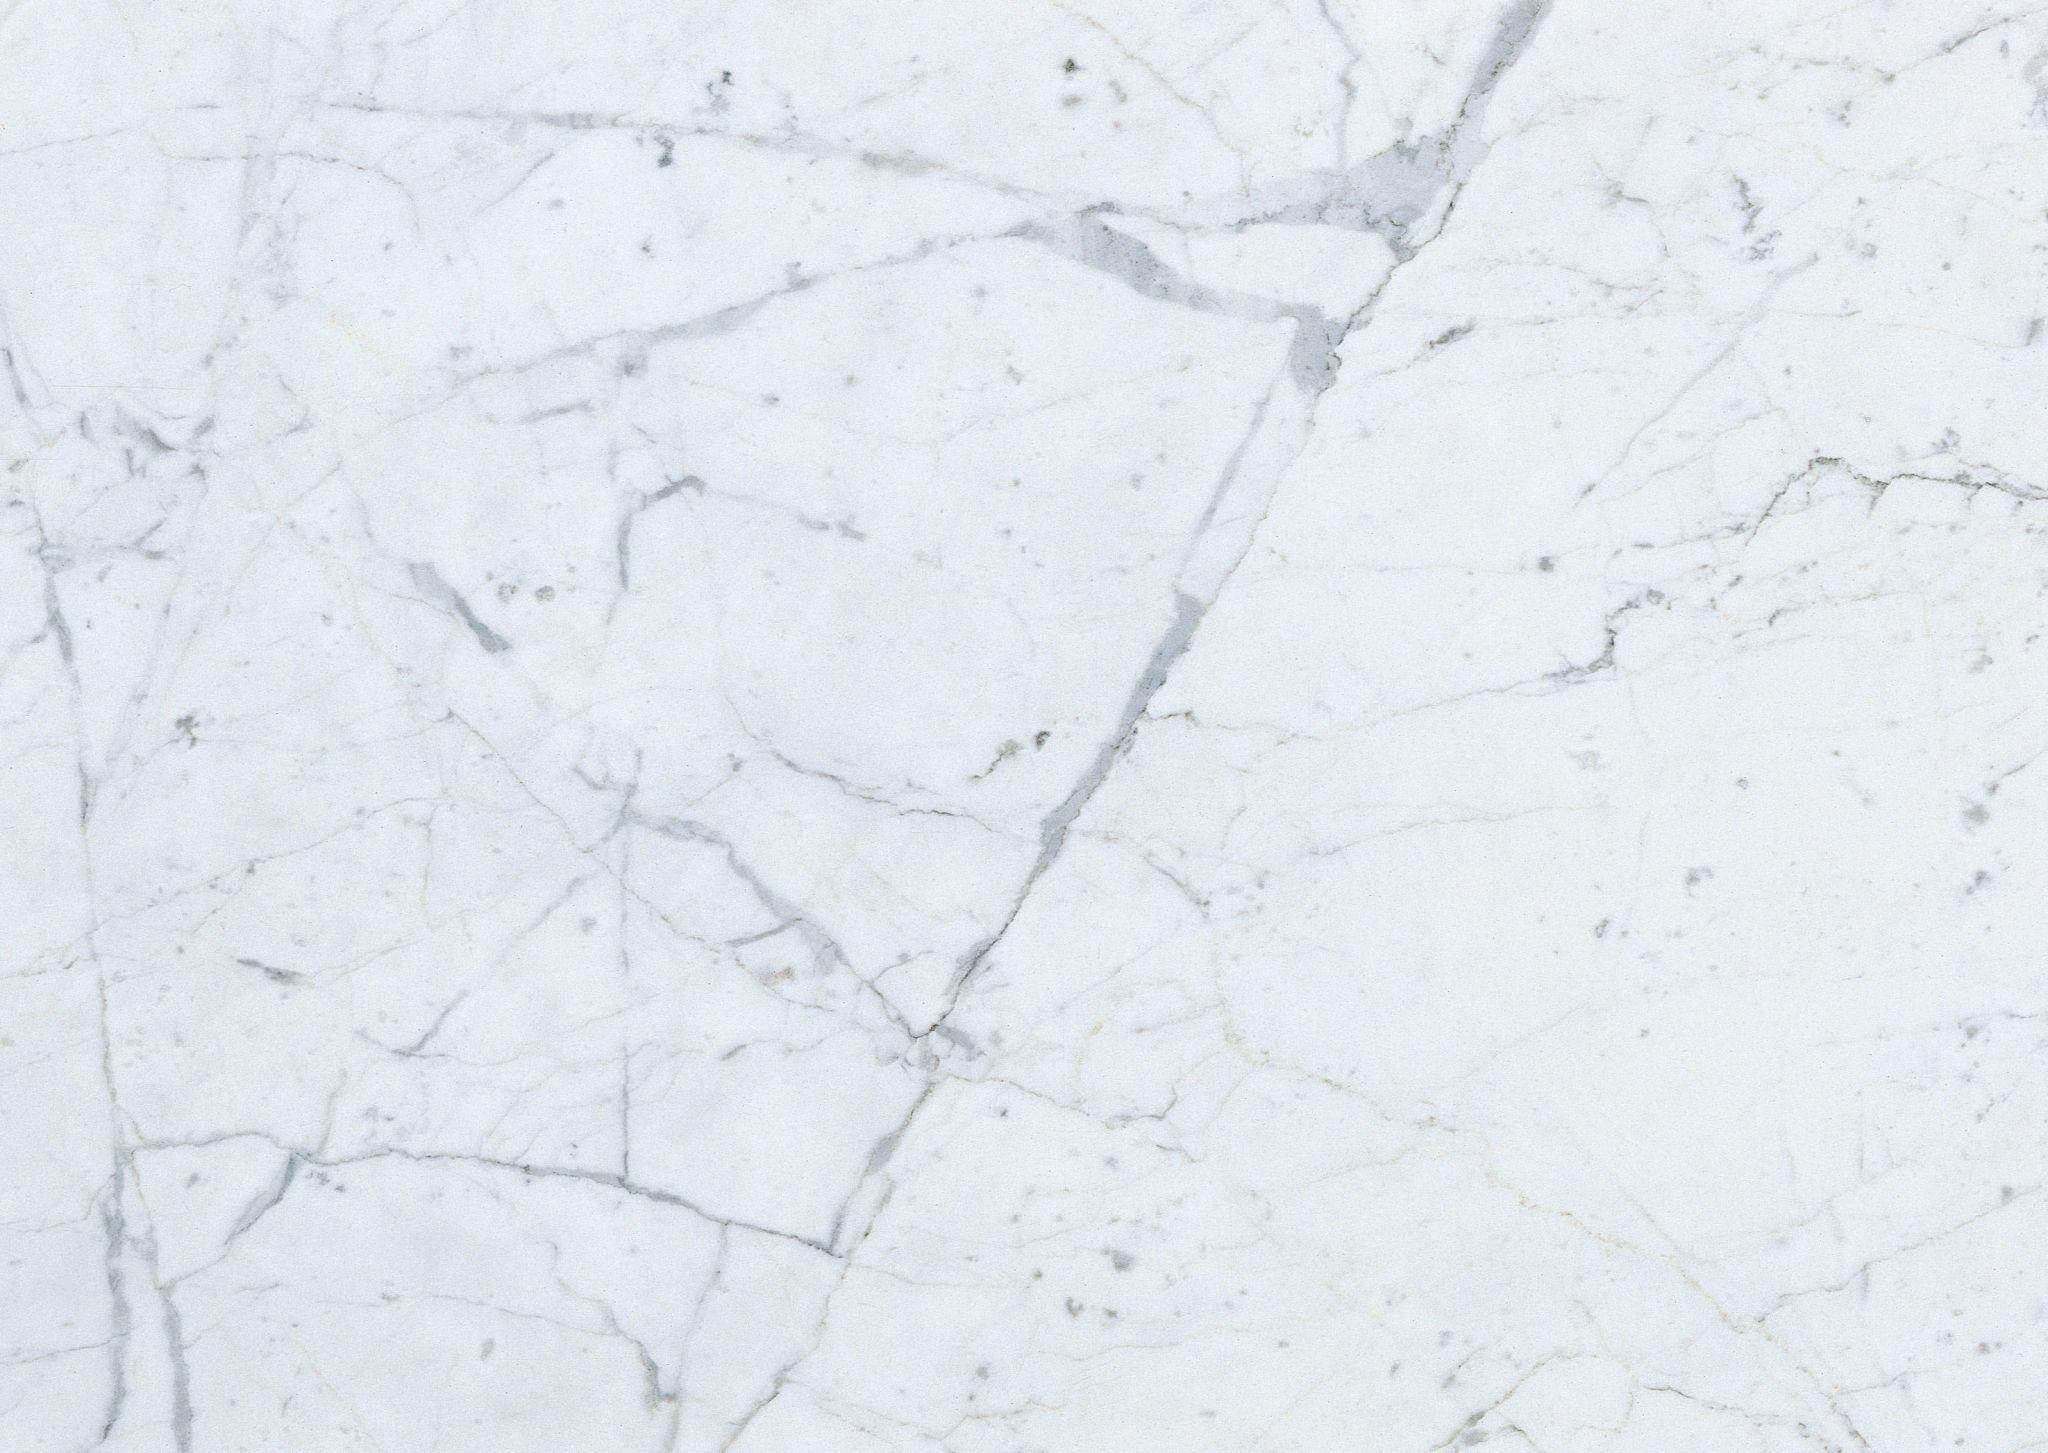 Most Inspiring Wallpaper High Quality Marble - 99b2074f48be65aa7645ec4696539b73  Graphic_74169.jpg